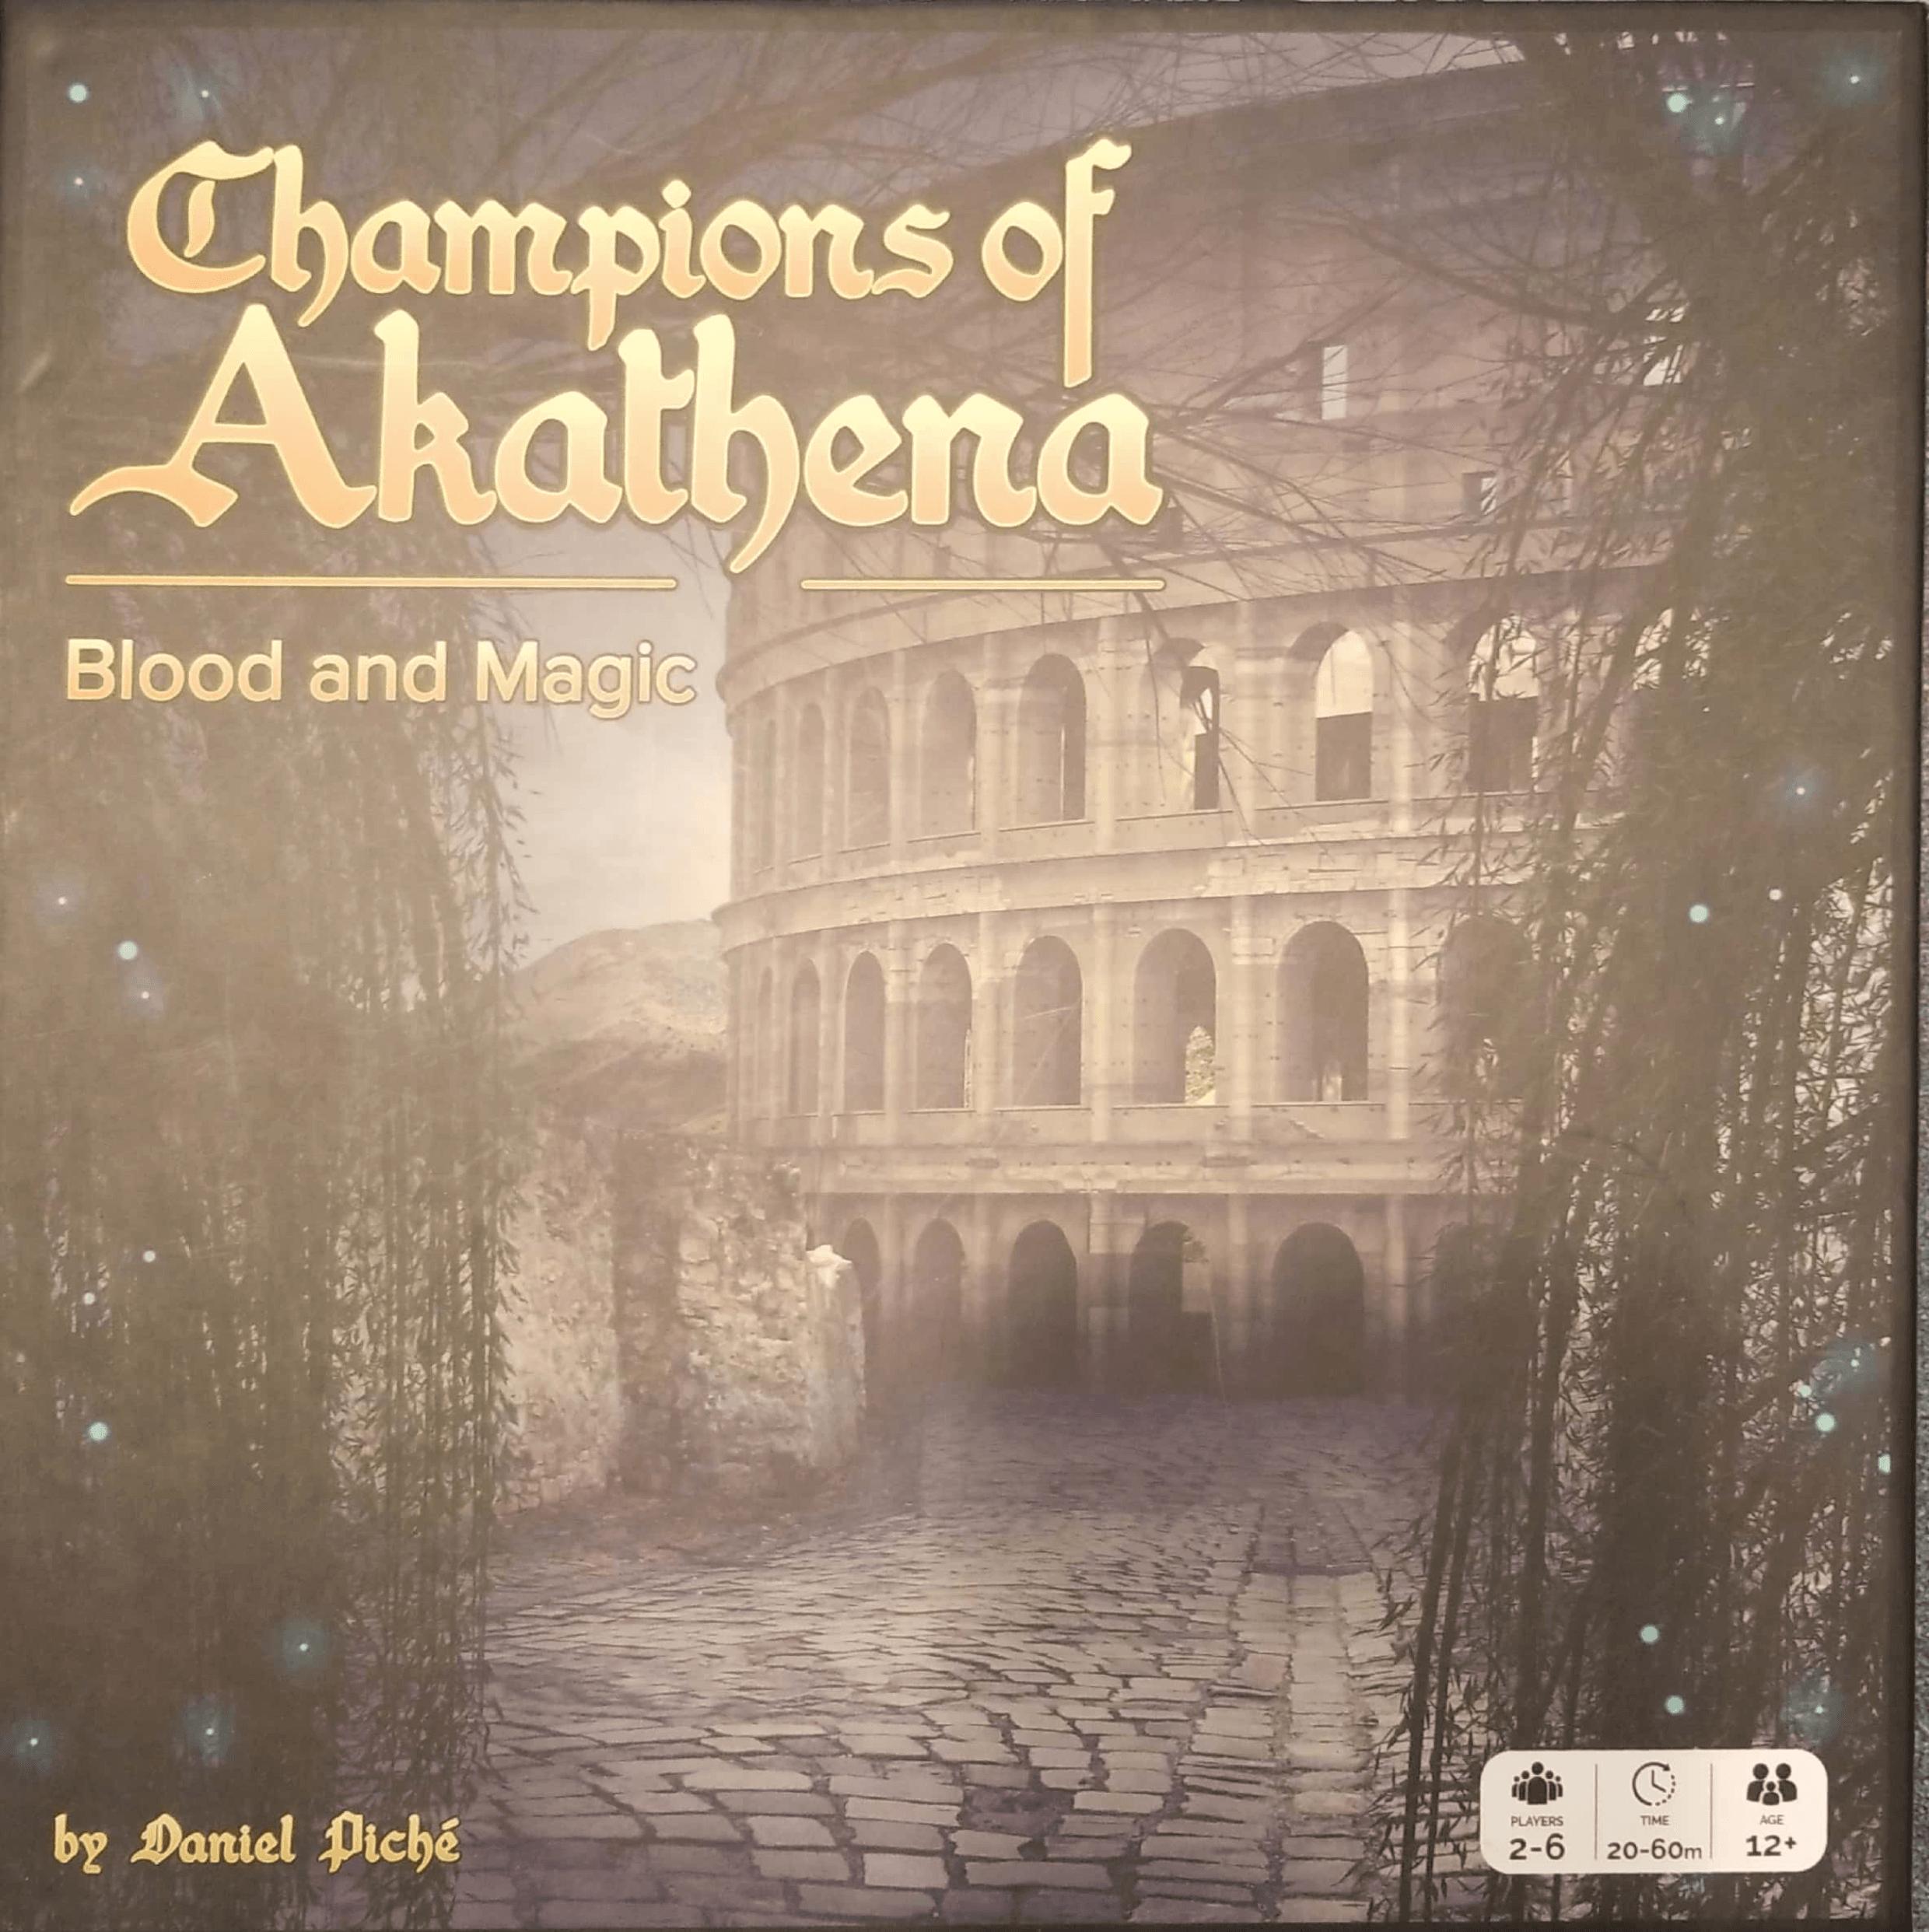 Champions of Akathena: Blood and Magic